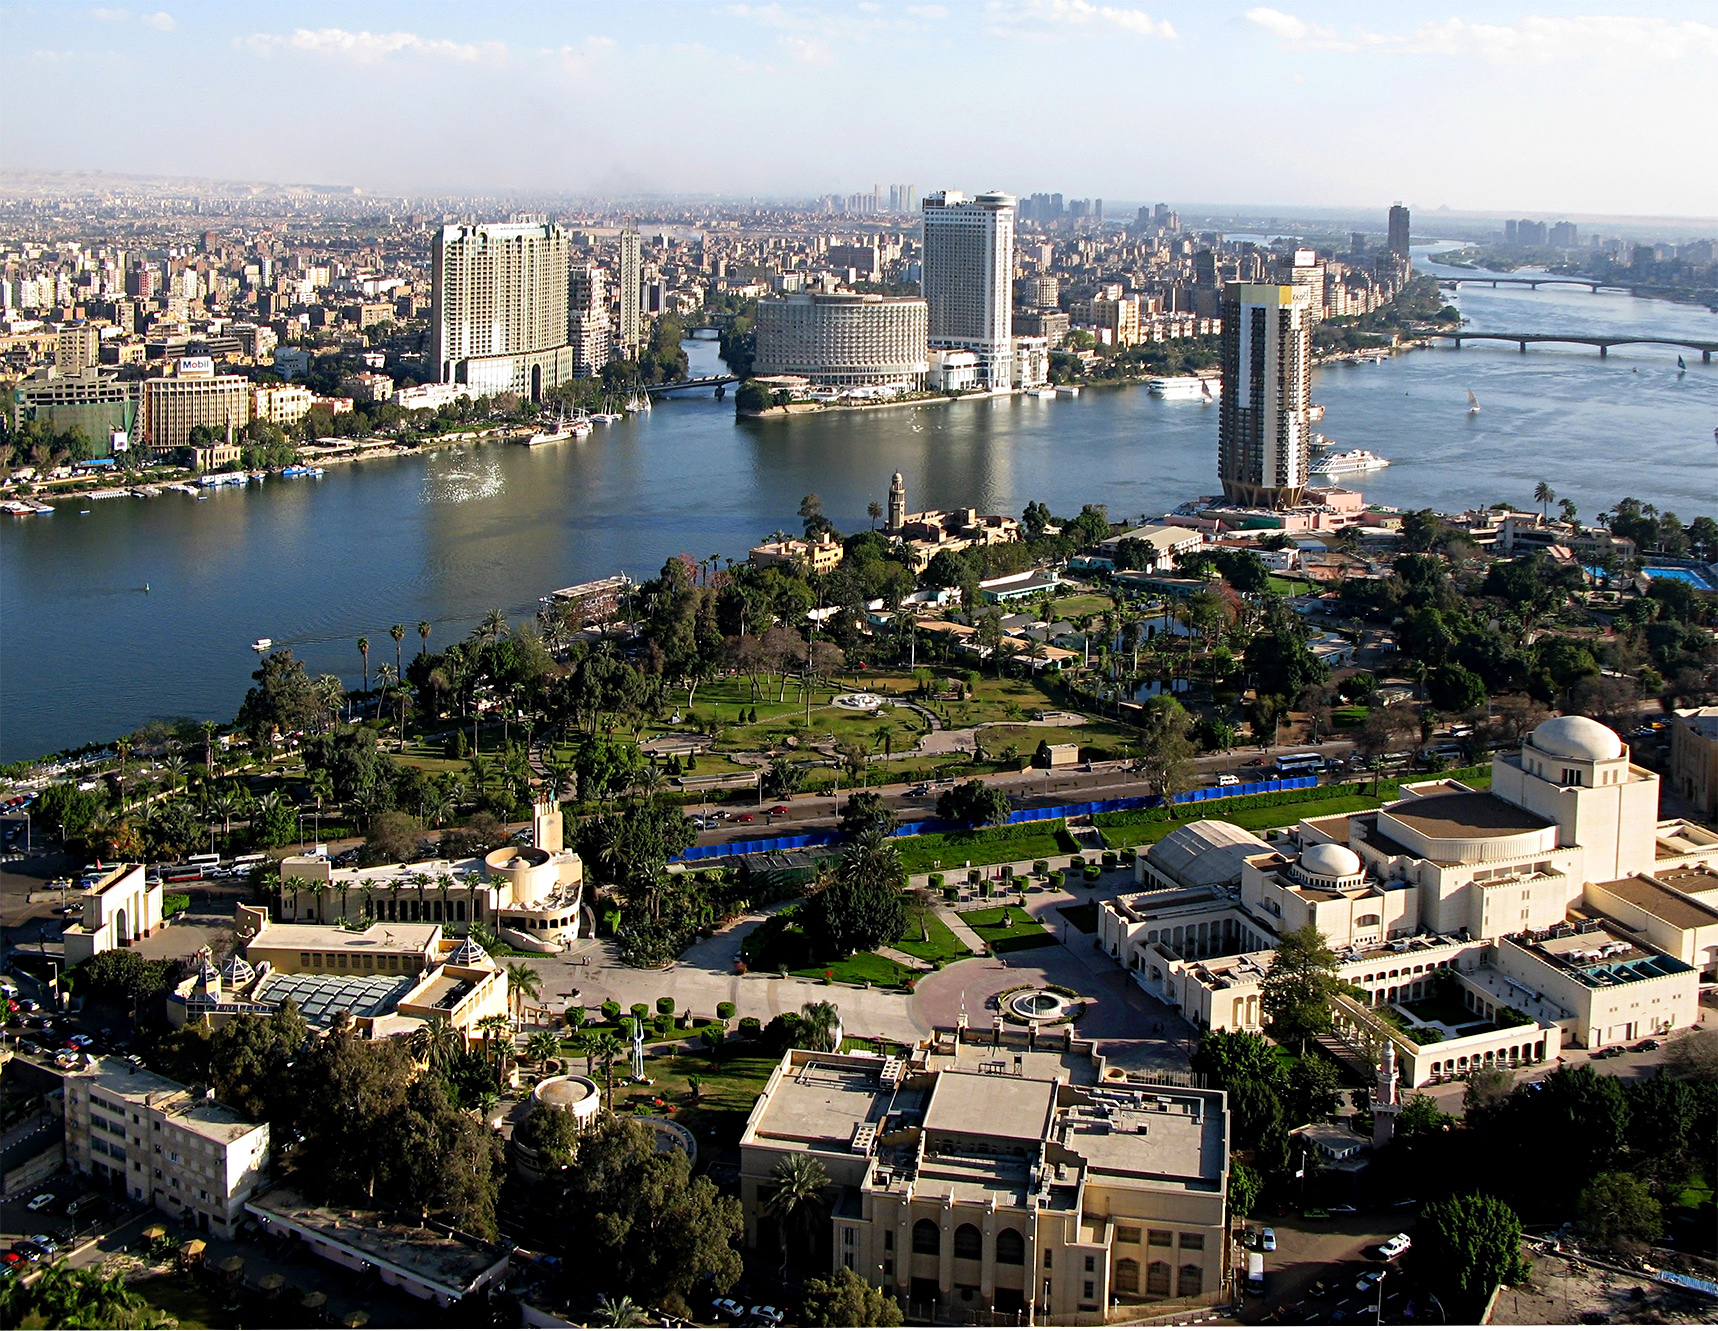 ���� ��� ������ ������� 2014 � ��� ����� ������� 2015 Cairo City